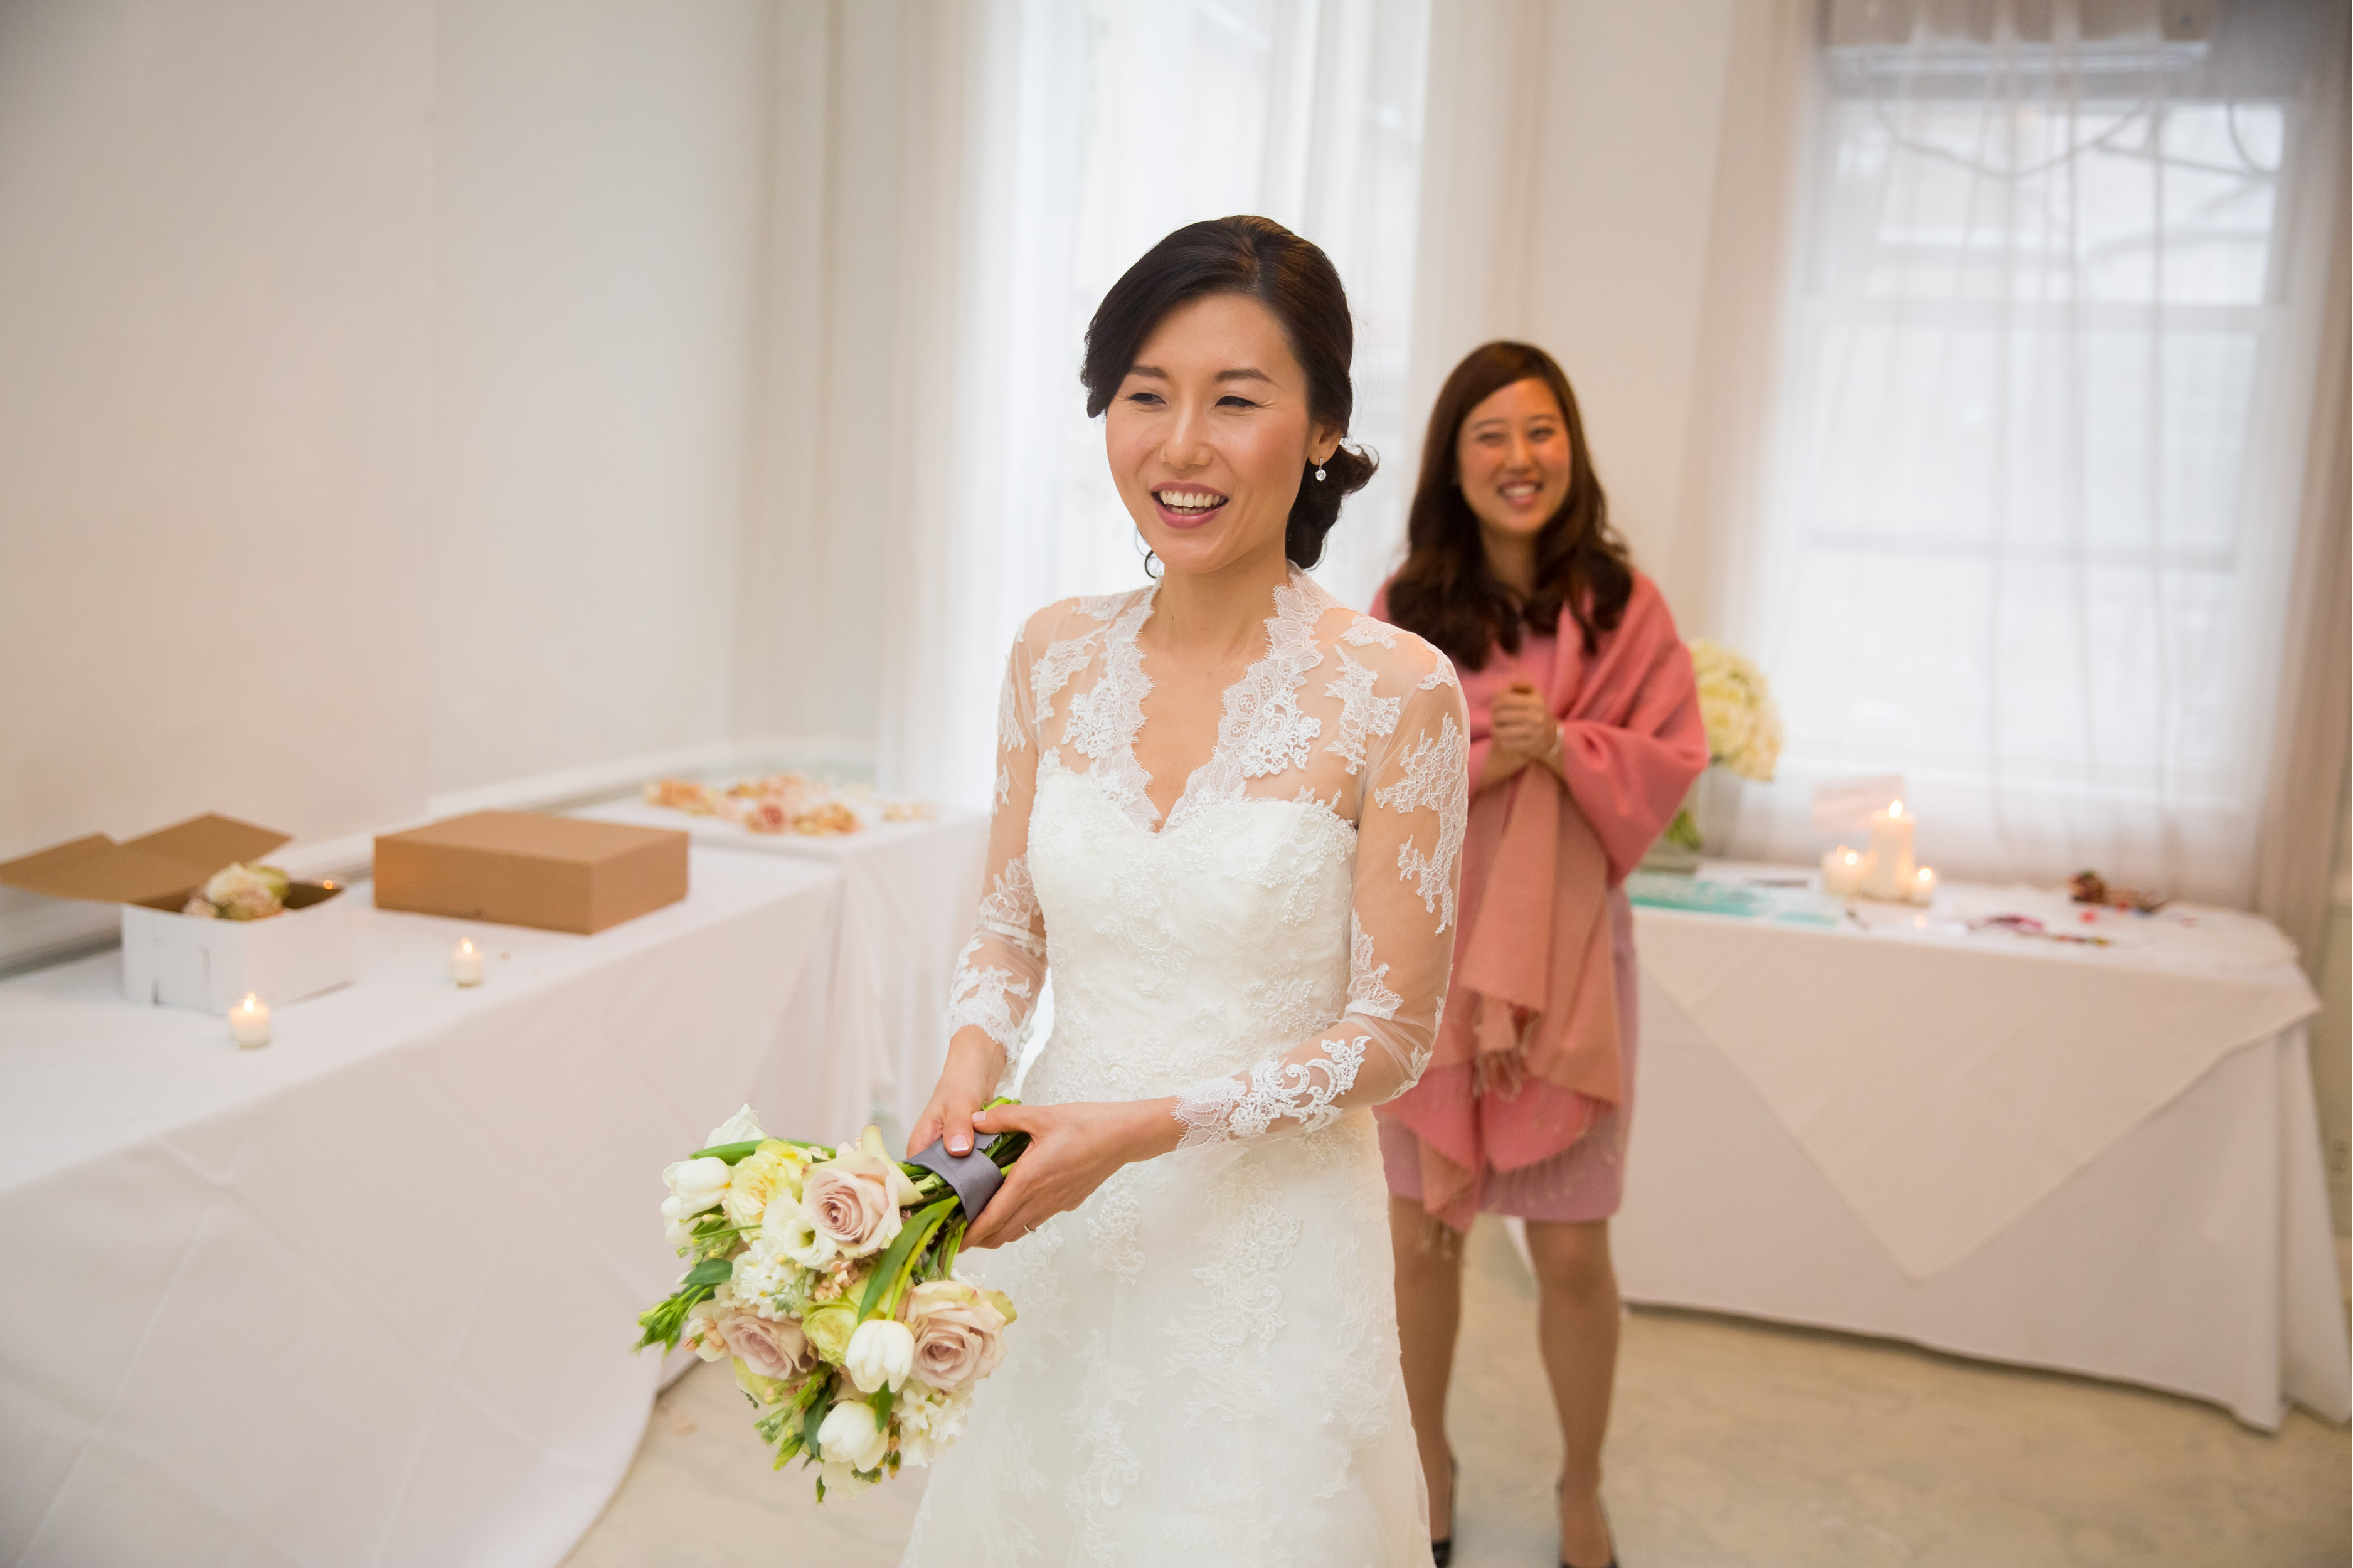 Emma_cleary_photography ici wedding24